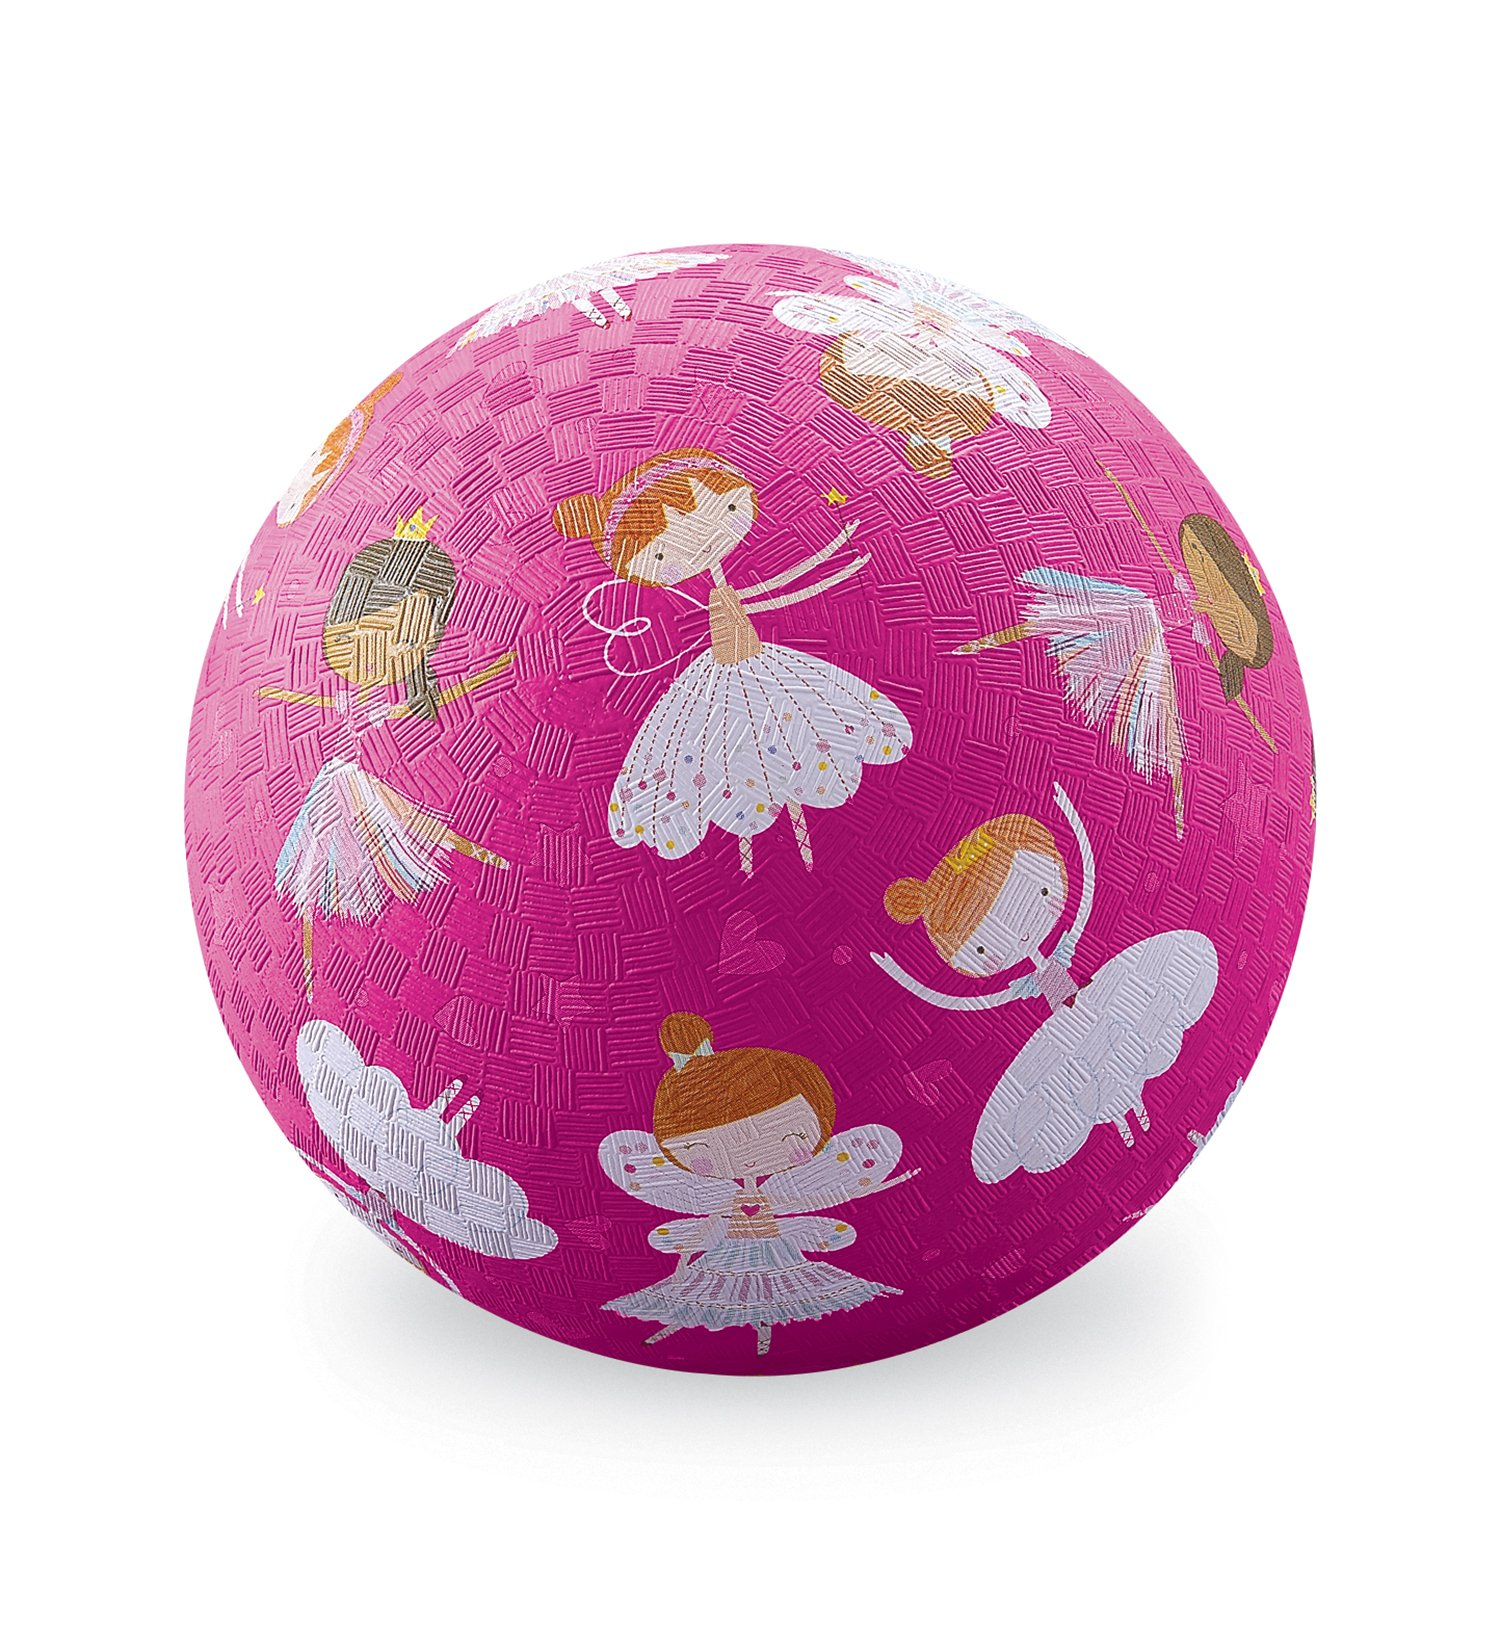 Crocodile Creek Sweet Dreams Ballerinas Fairies Playground Balls, Pink/Purple/White/Tan/Brown, 5'' by Crocodile Creek